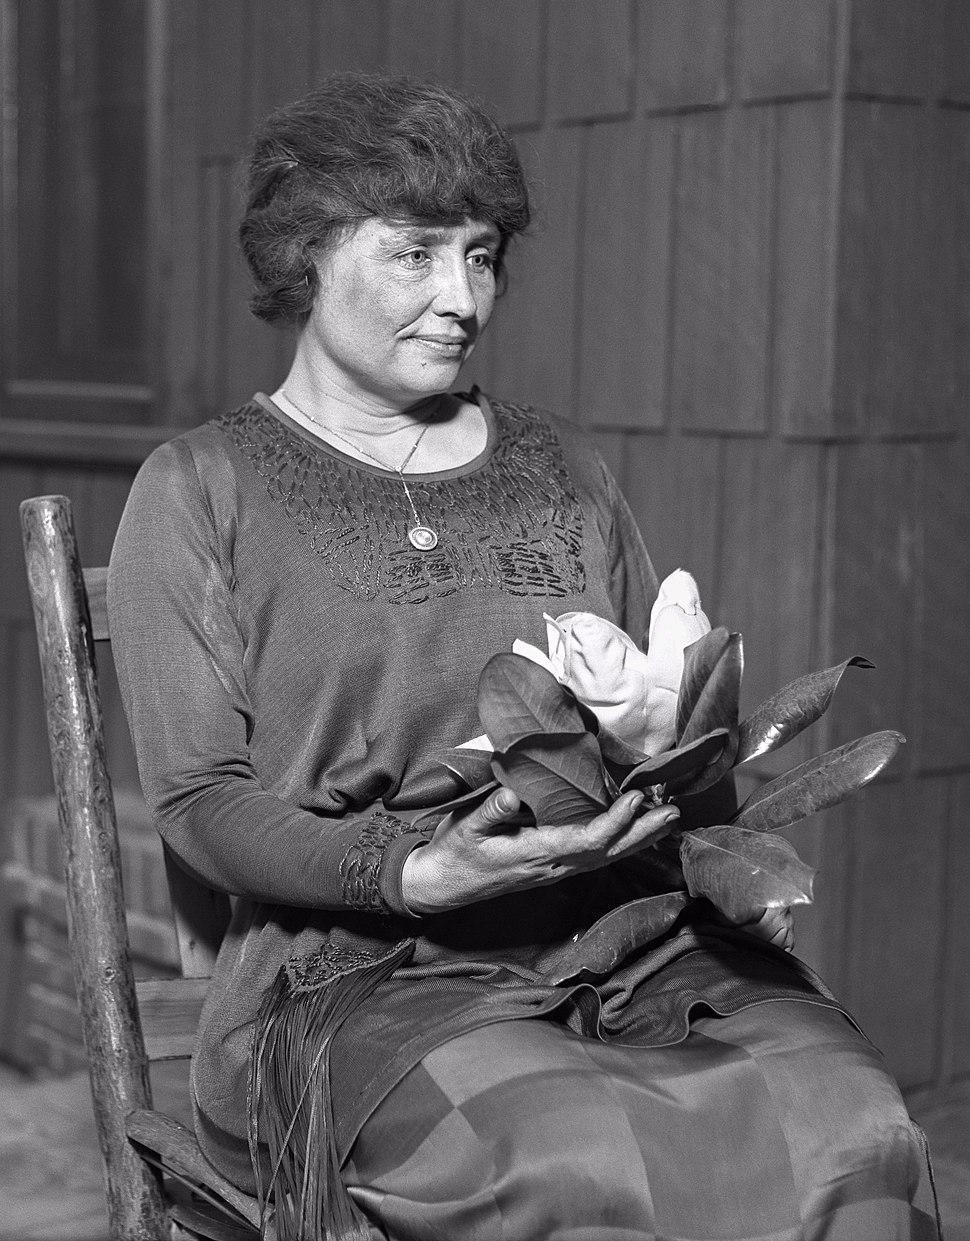 Helen Keller holding a magnolia, ca. 1920